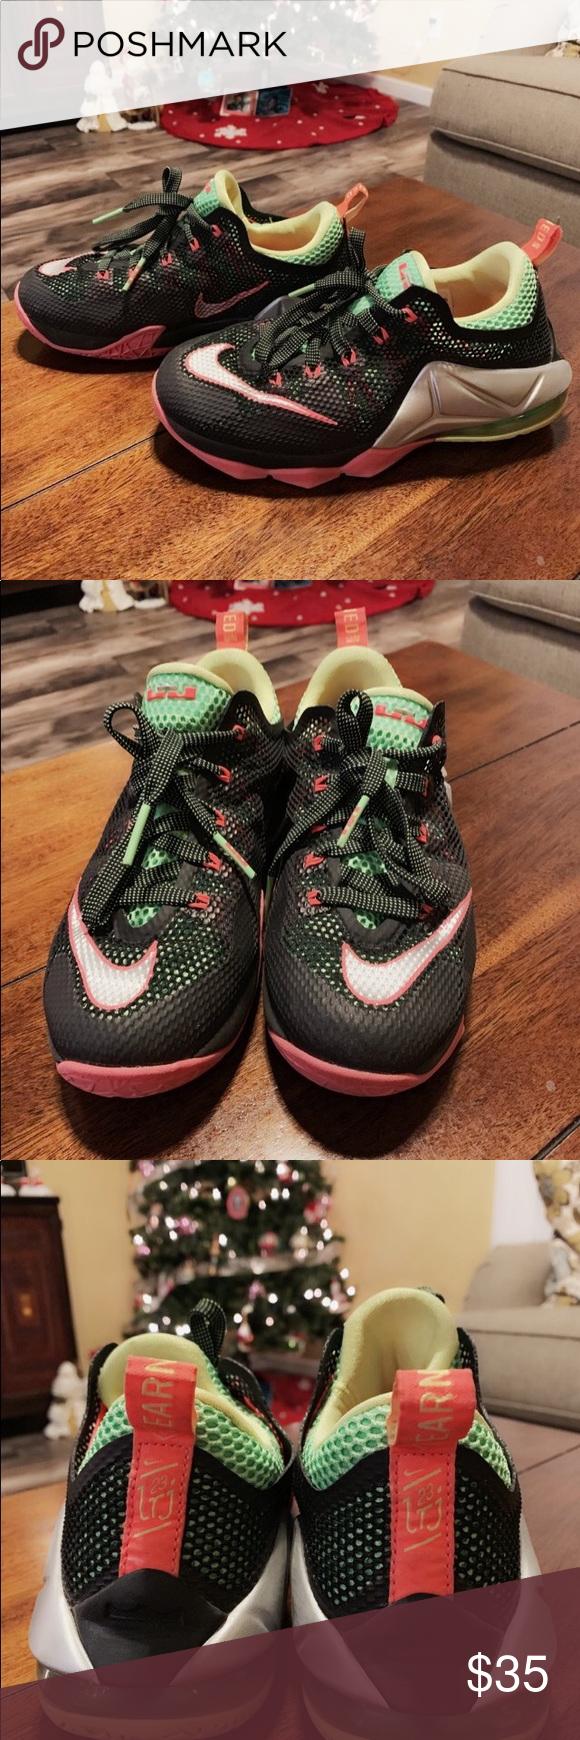 premium selection a656e 61a49 Kids Lebron James basketball shoes Size 4.5 kids Lebron James basketball  shoes Nike Shoes Sneakers